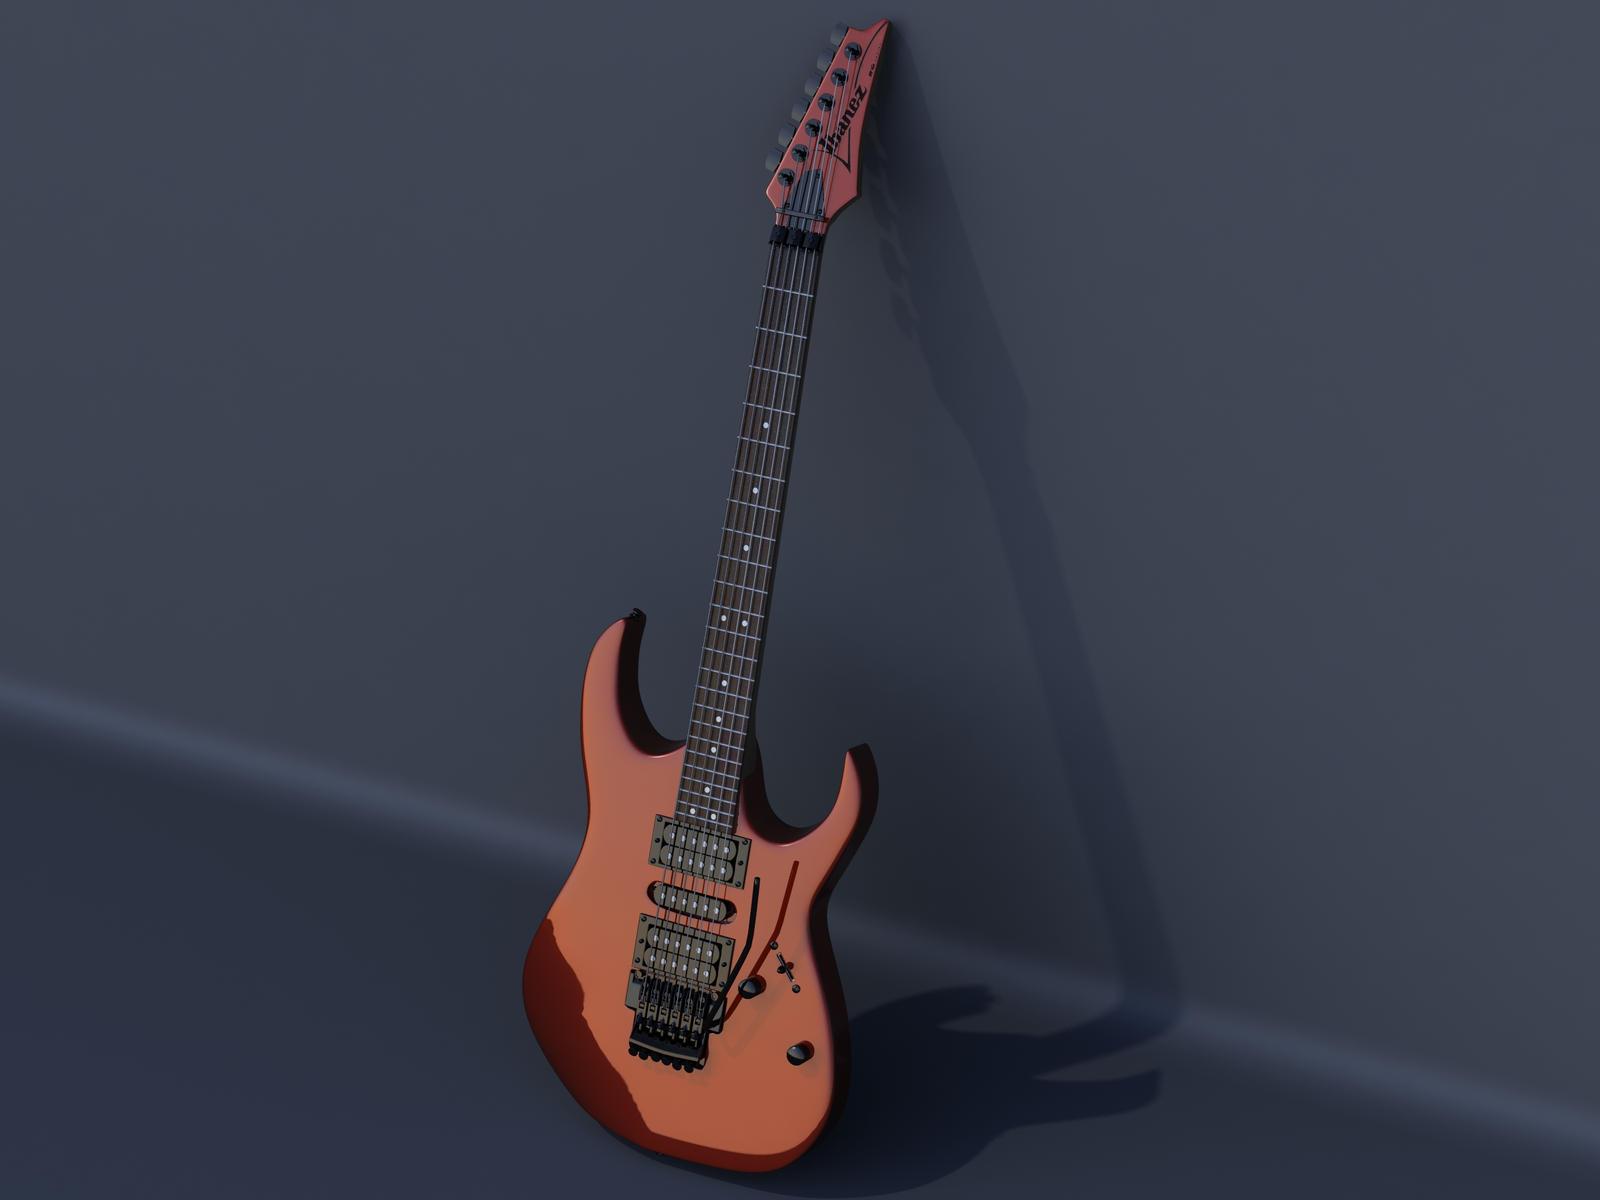 3d ibanez rg series guitar by goeol edhel on deviantart. Black Bedroom Furniture Sets. Home Design Ideas